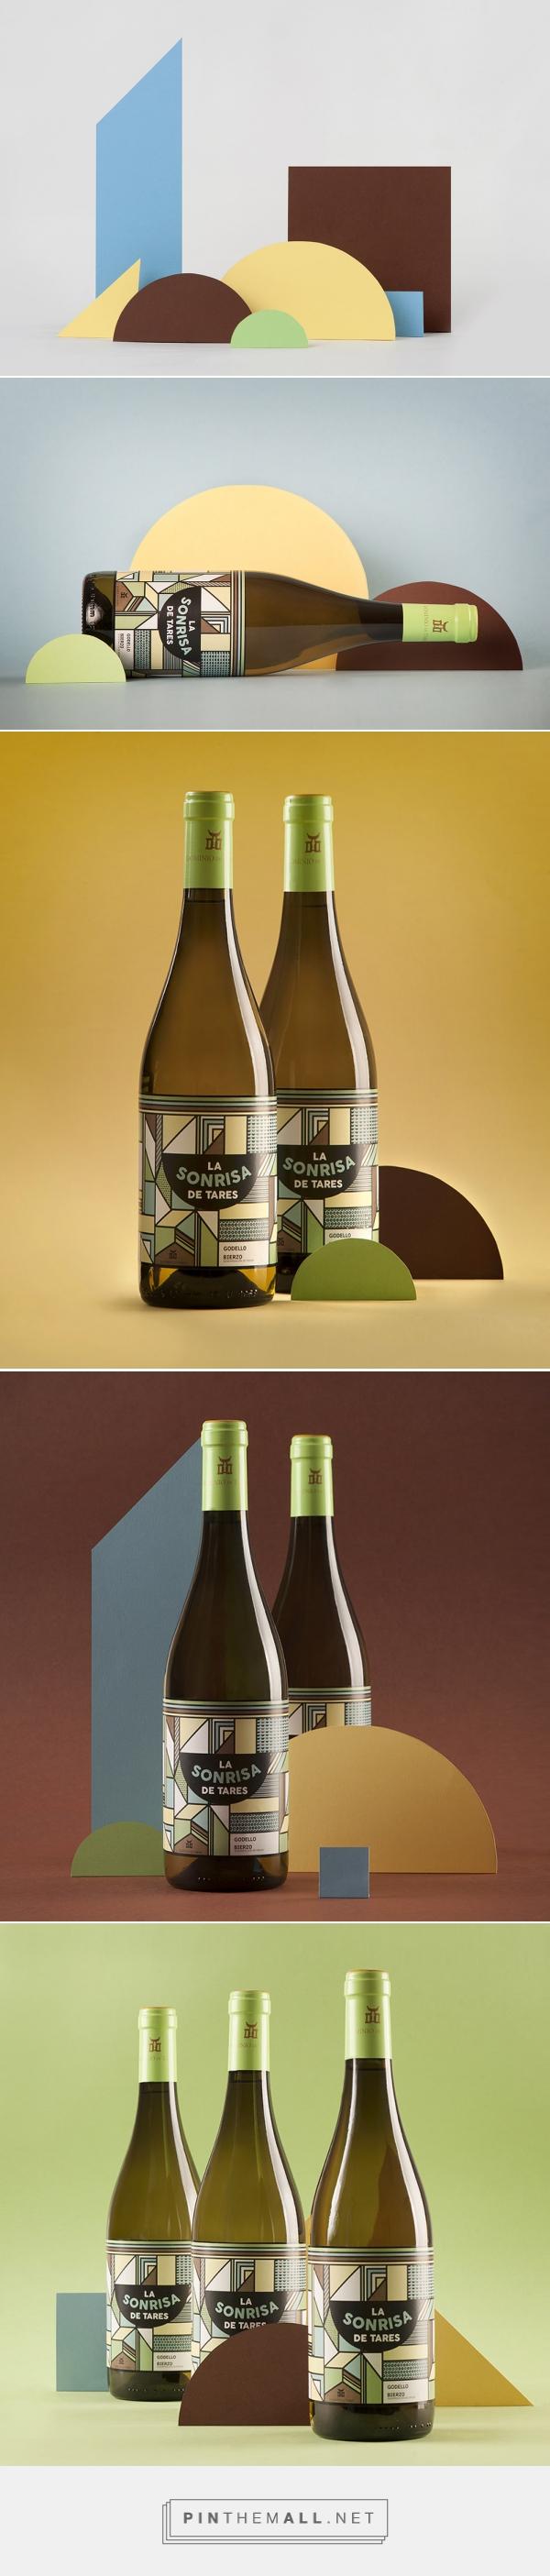 La Sonrisa de Tares Wine - Packaging of the World - Creative Package Design Gallery - http://www.packagingoftheworld.com/2016/10/la-sonrisa-de-tares.html